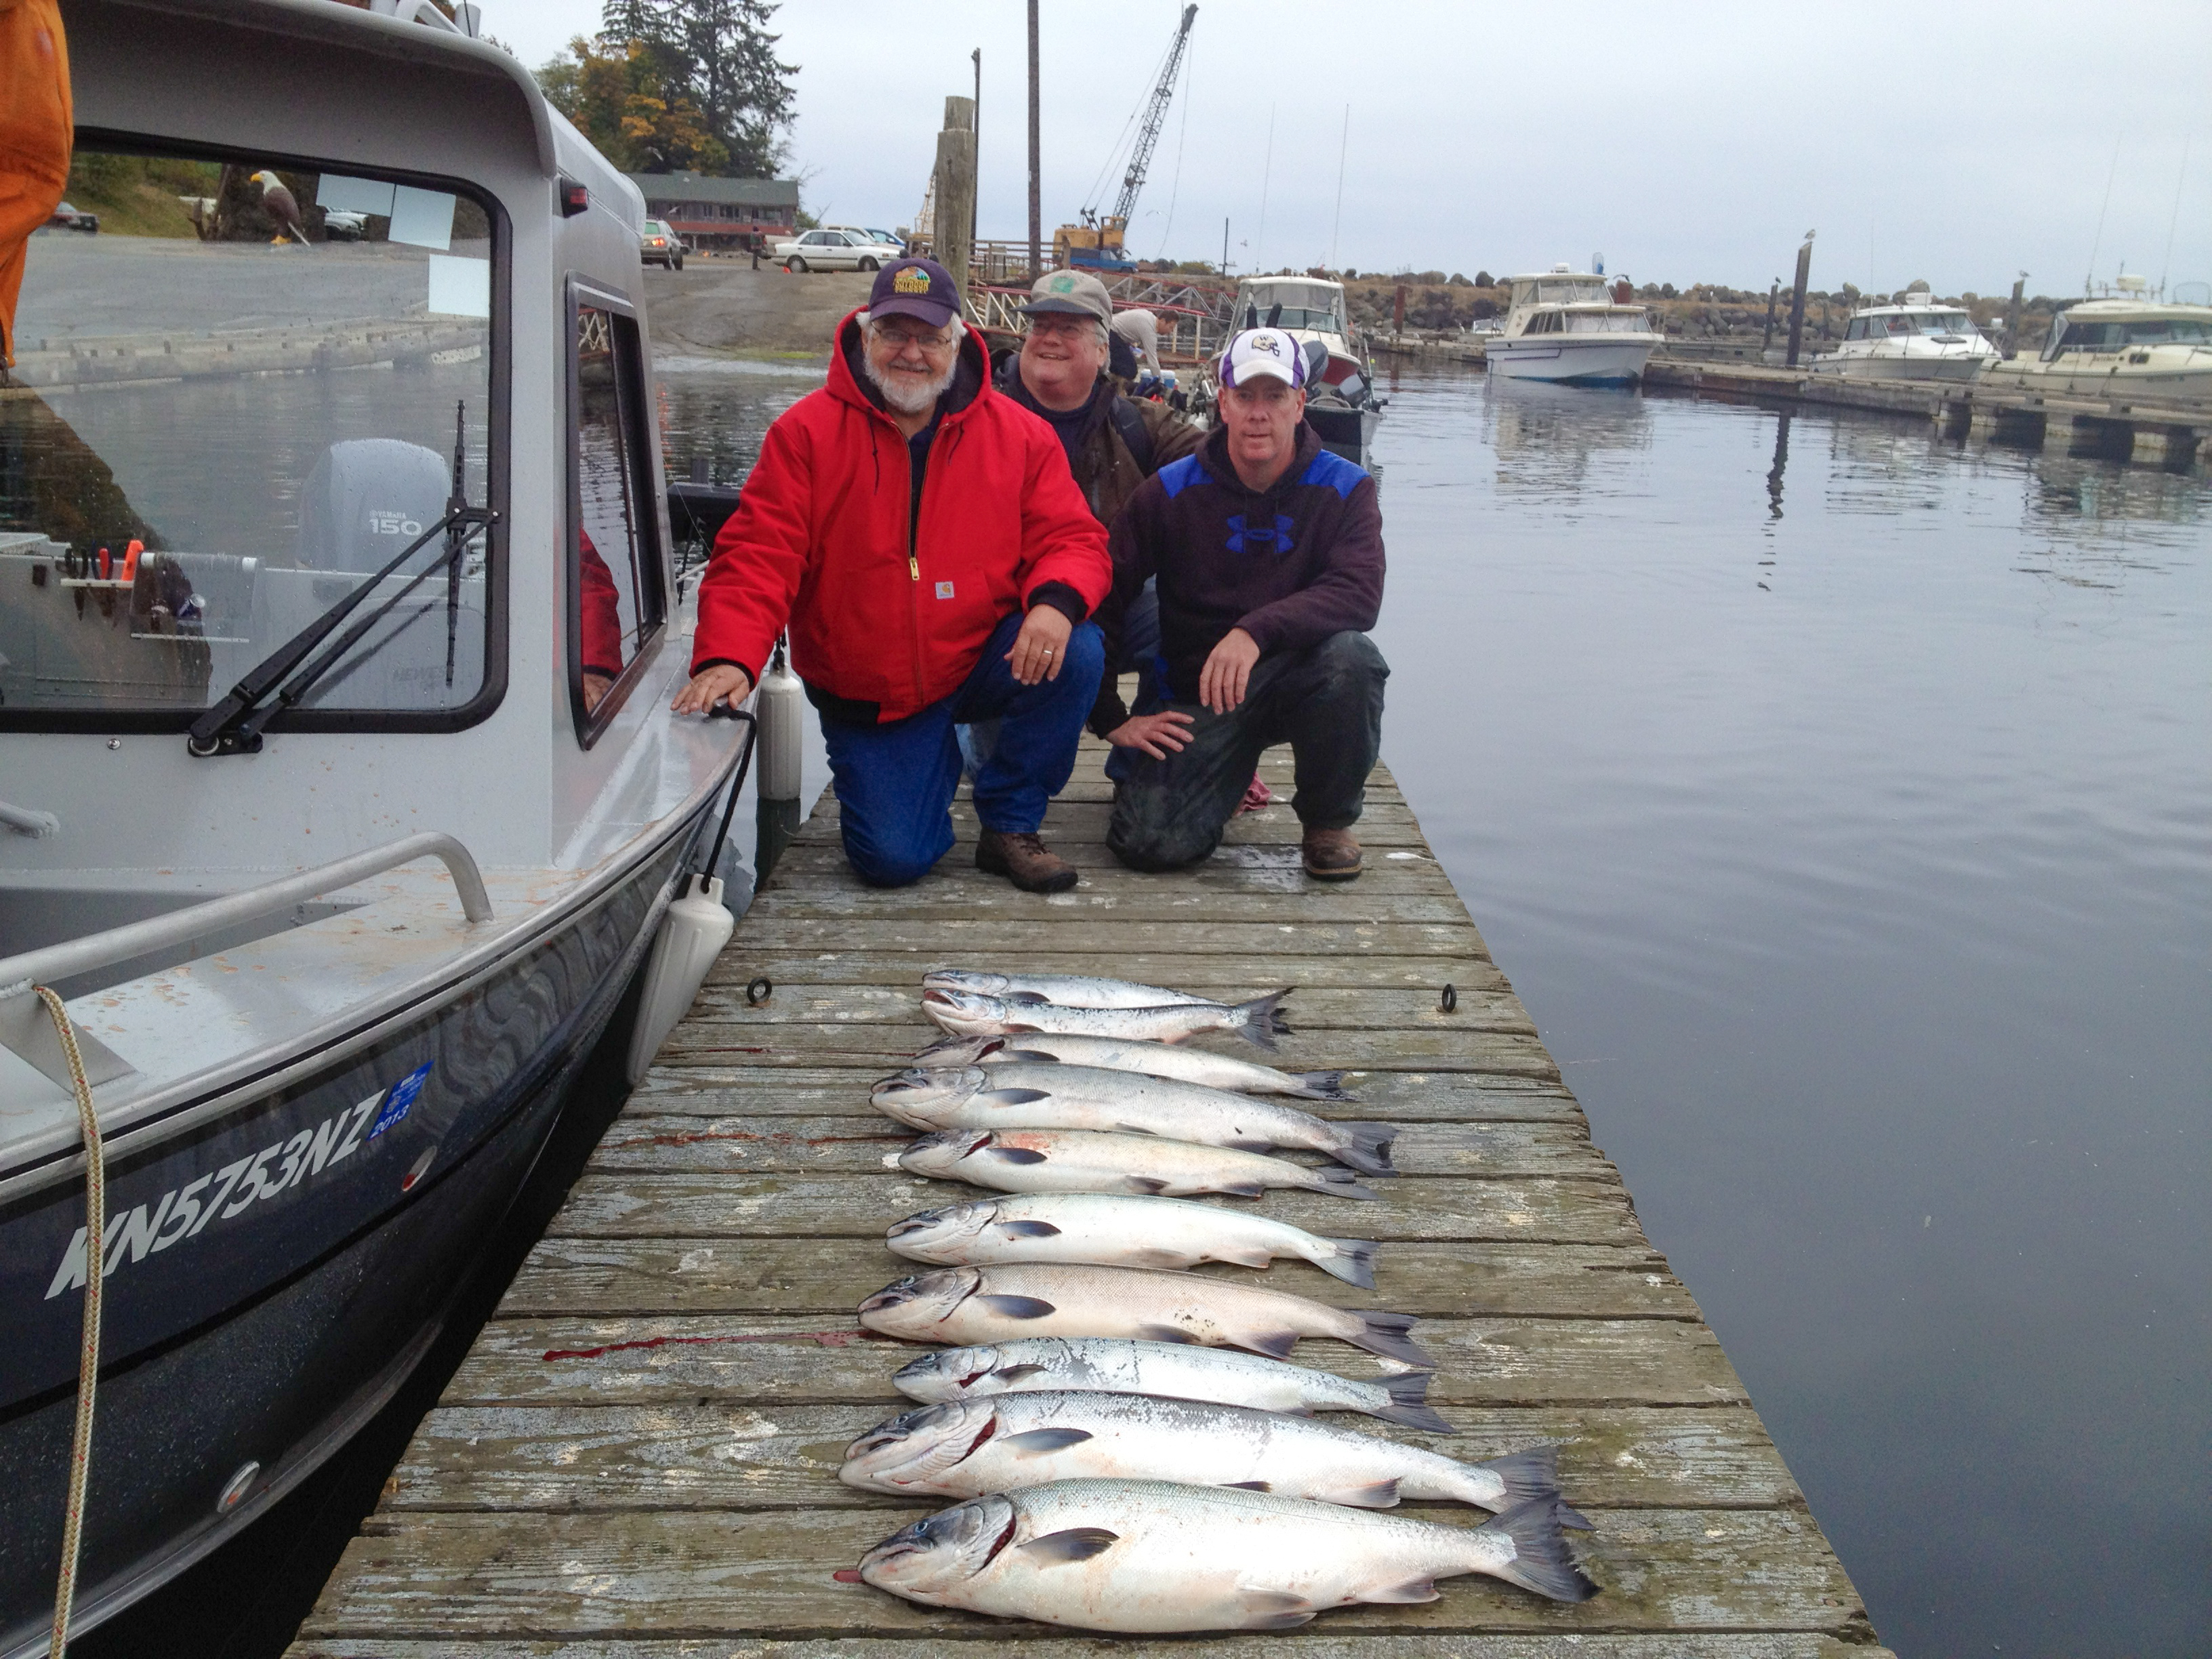 Forks wa fish tale guide service washington fishing for Salmon fishing season washington